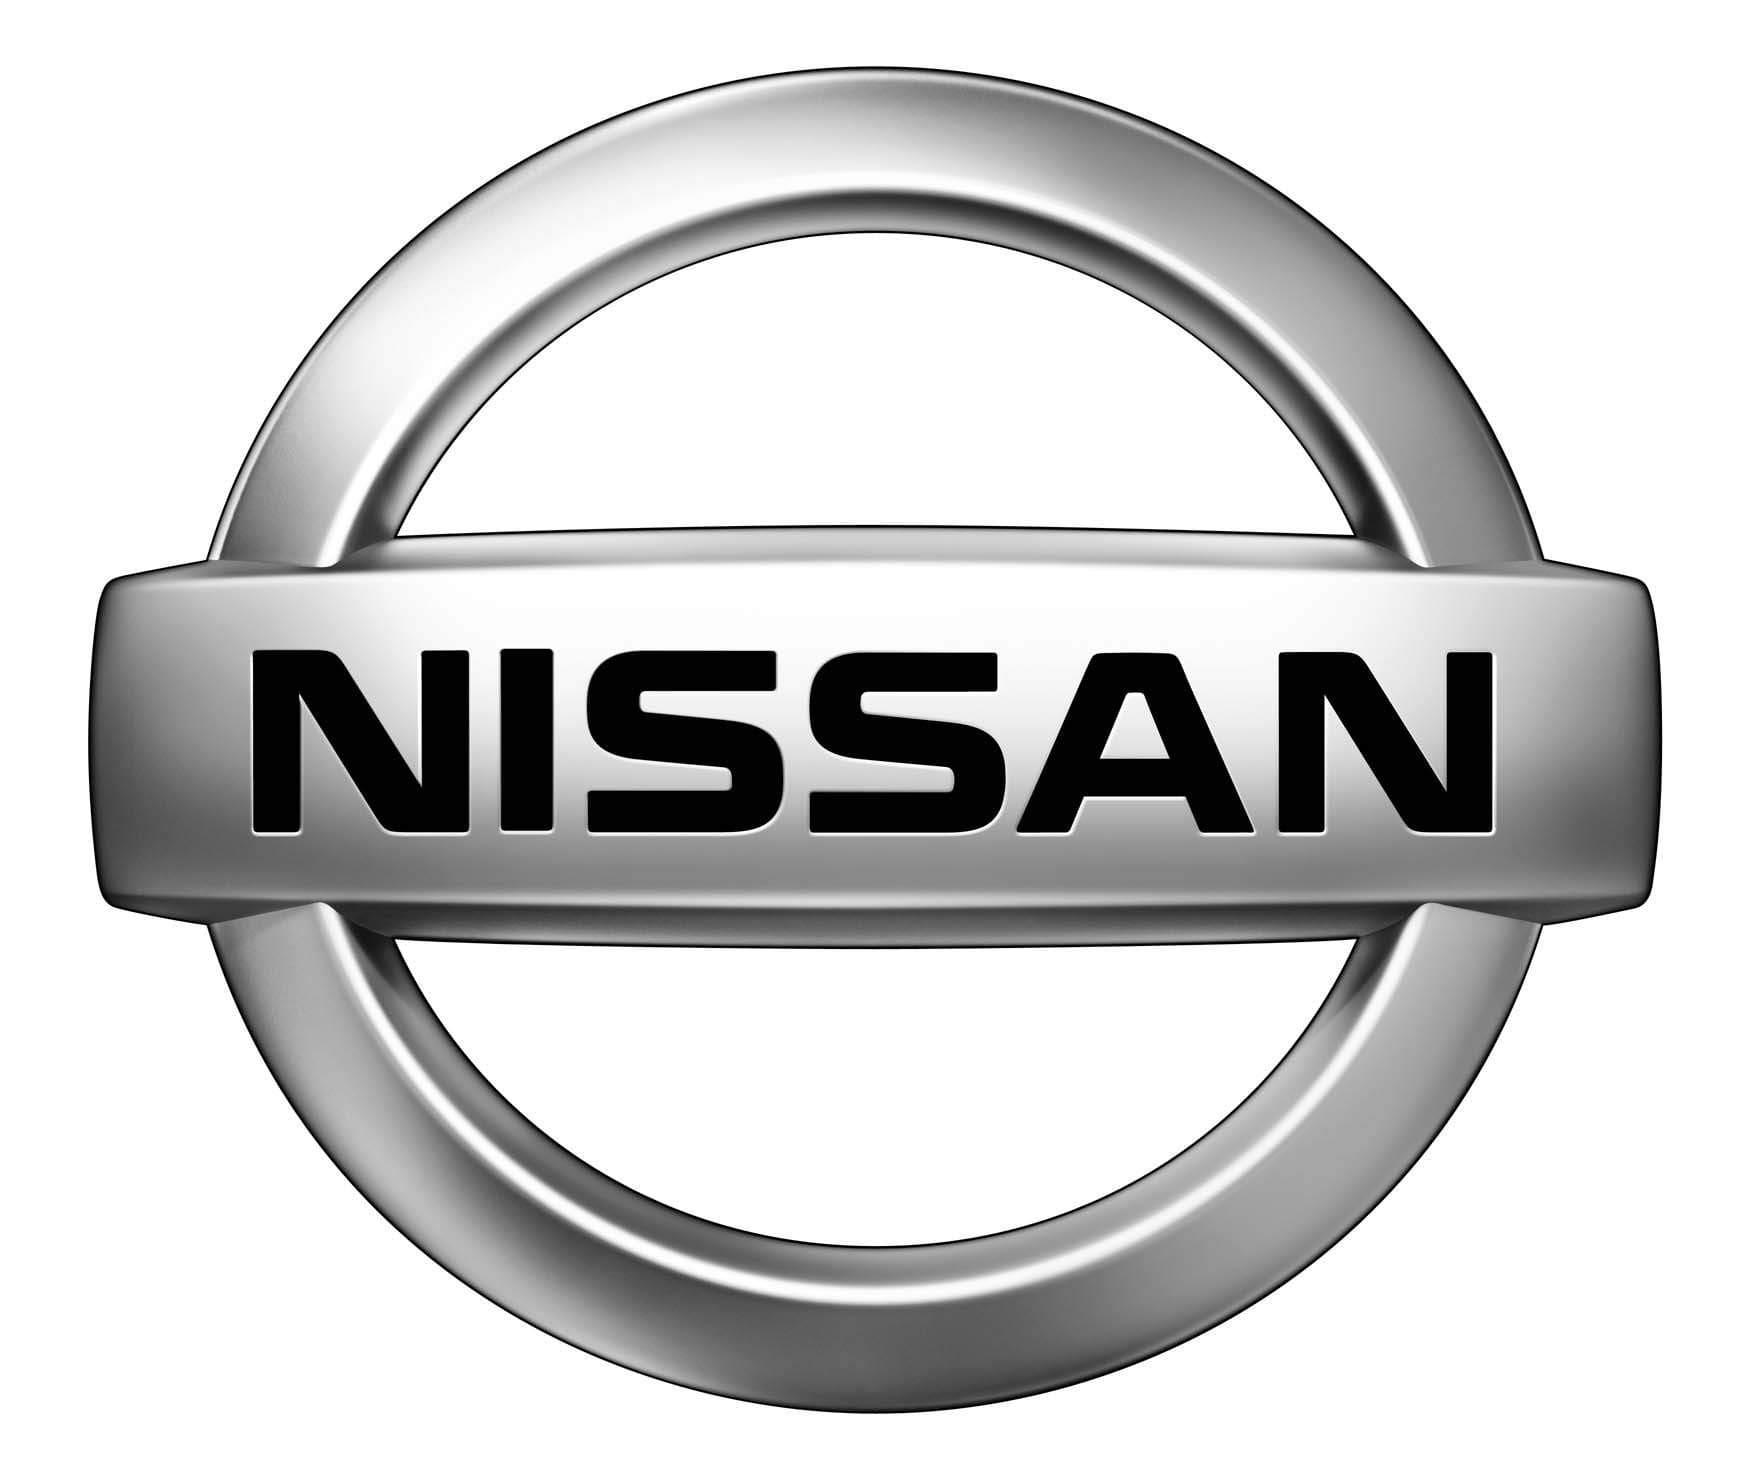 Nissan skyline er34 nismo z tune logo